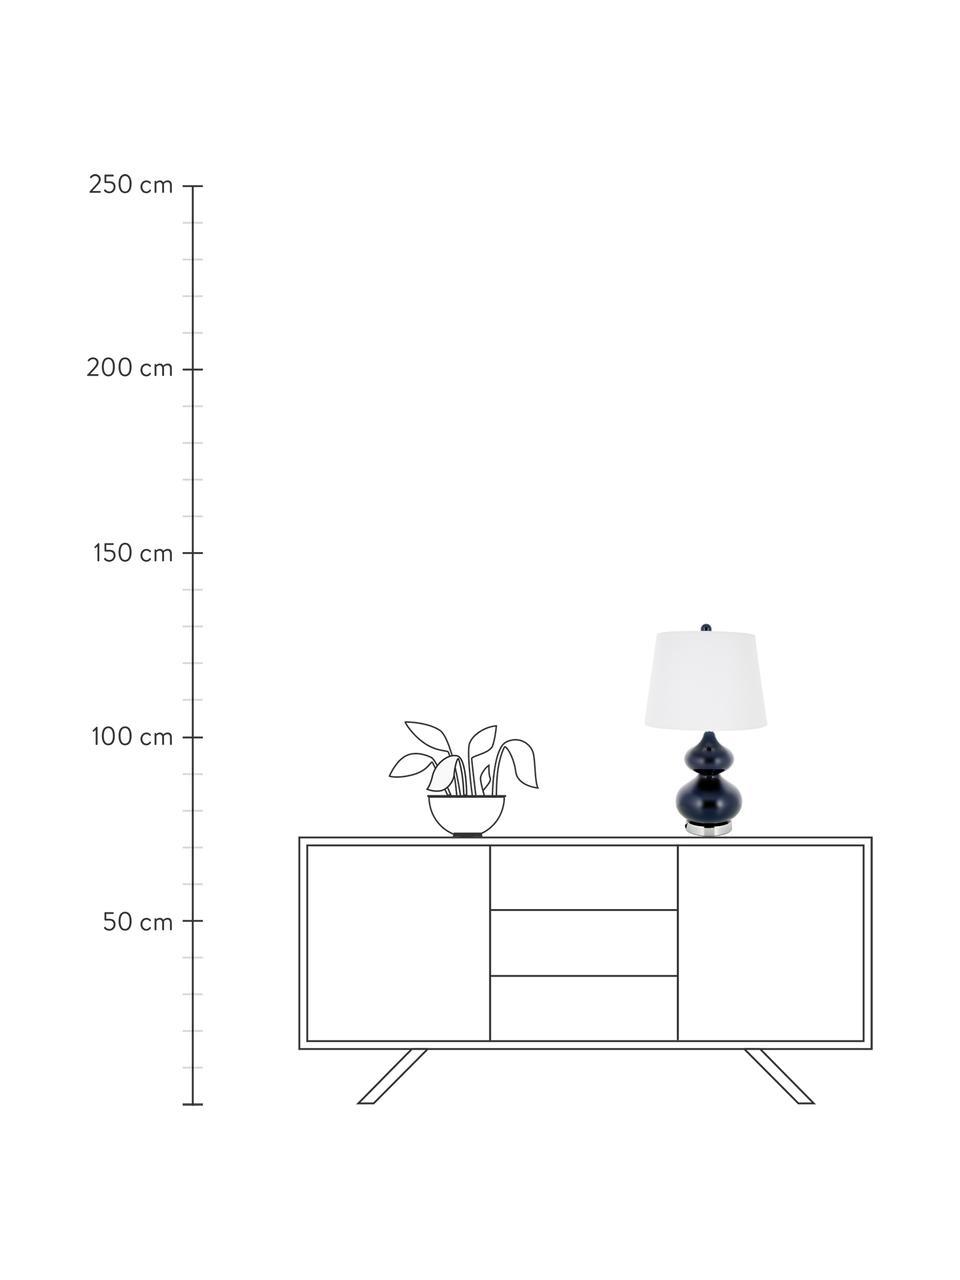 Grote tafellampen Felicitas,  2 stuks, Lampenkap: katoen, Lampvoet: gelakt glas, Voetstuk: metaal, Blauw, Ø 35 x H 58 cm